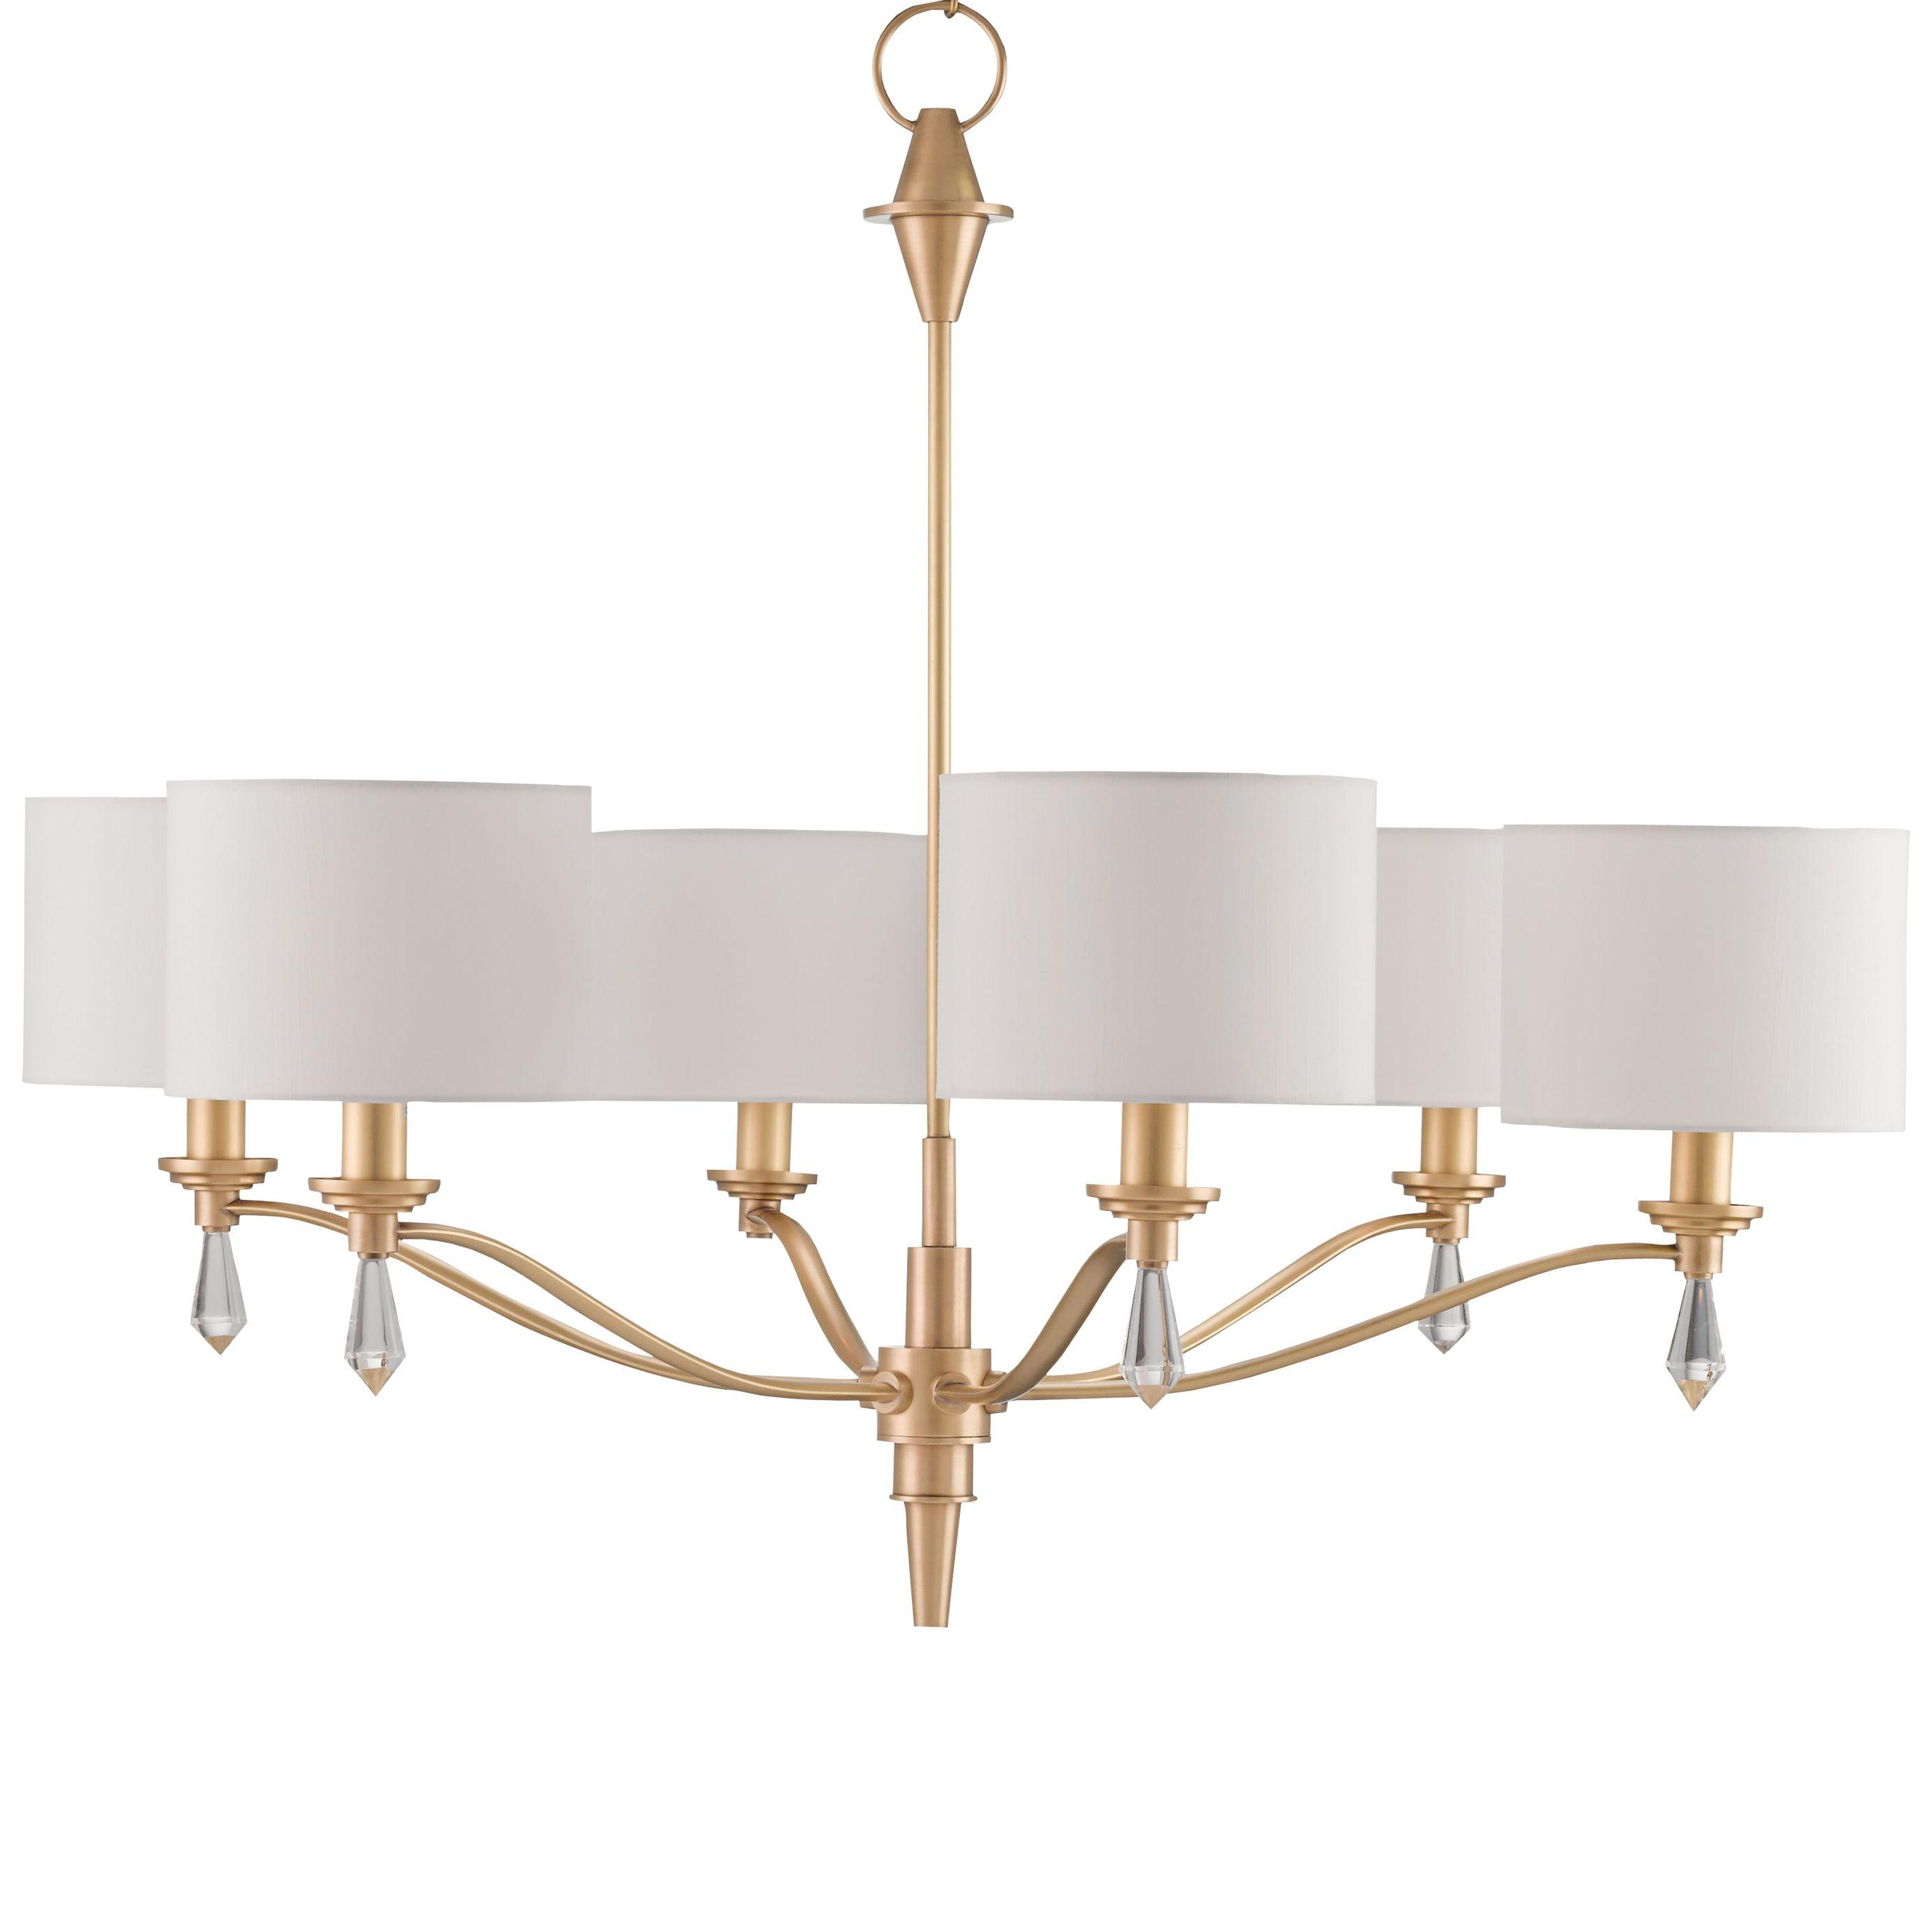 Kim Modern Classic Brushed Gold Crystal Finial 6 Light Chandelier In 2020 Chandelier Design Chandelier Lighting Chandelier